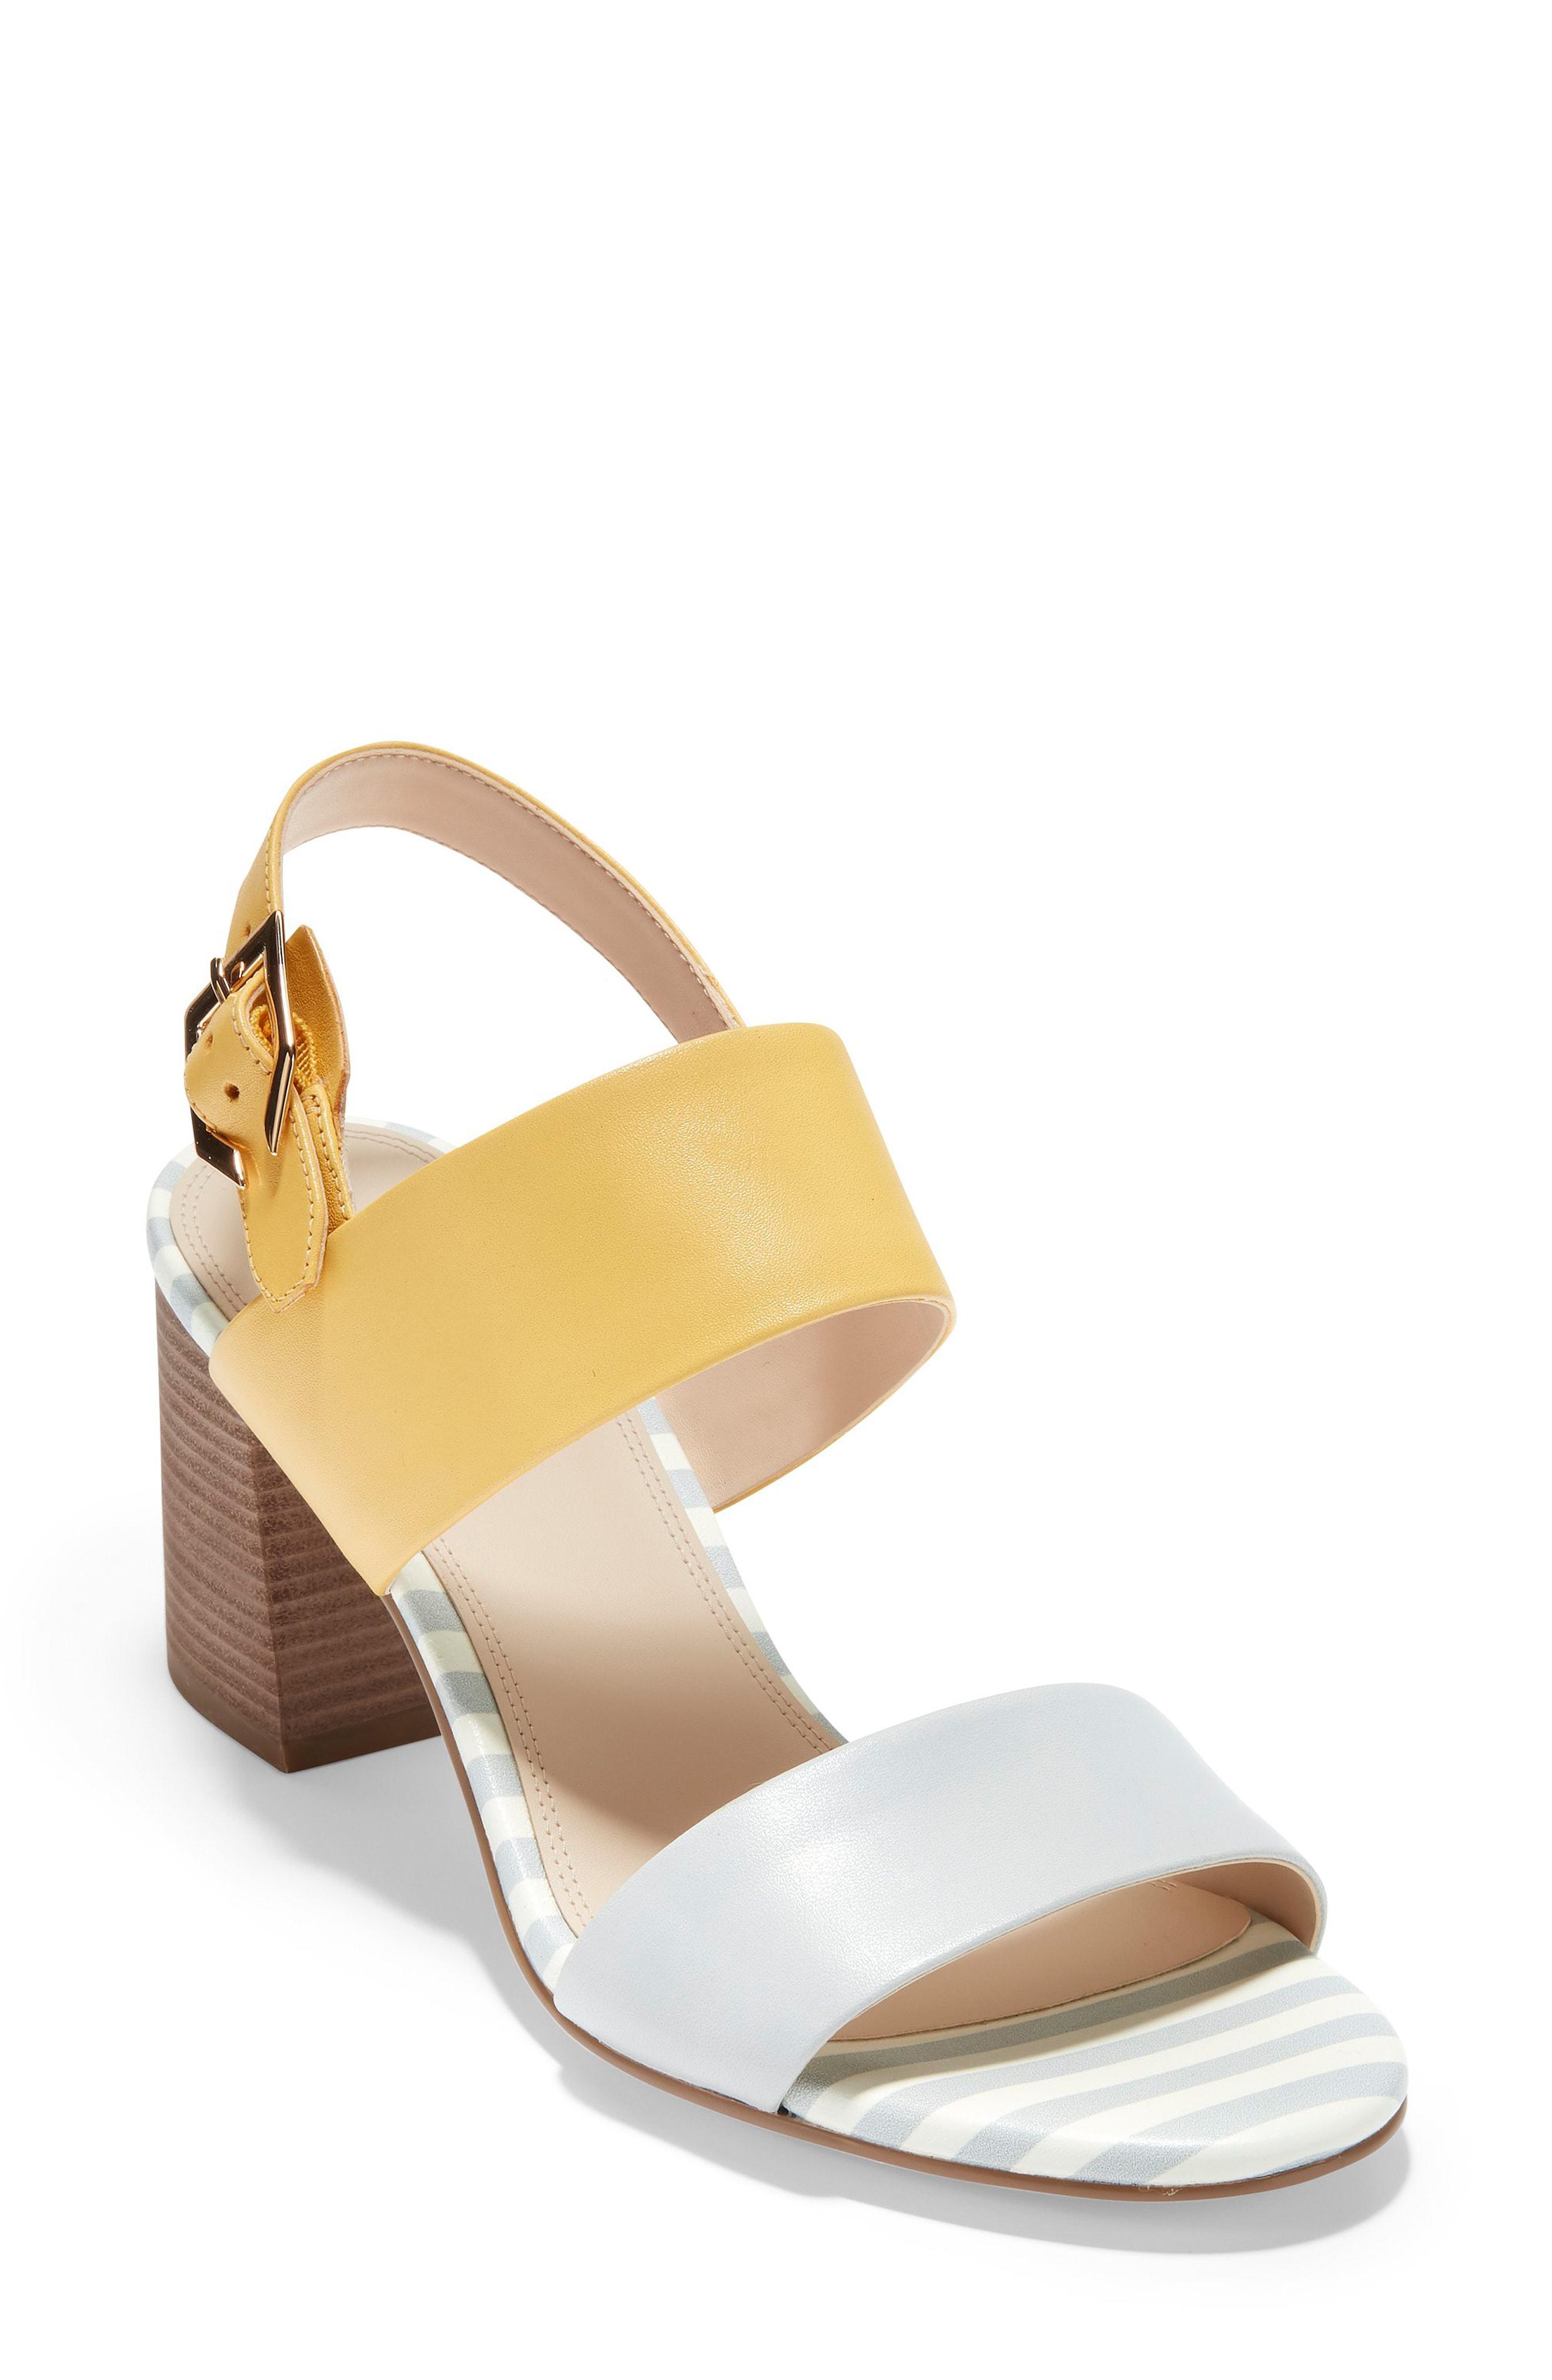 6a62694a1ee Cole Haan Avani Block Heel Sandal In Harbor Mist  Gold Leather ...